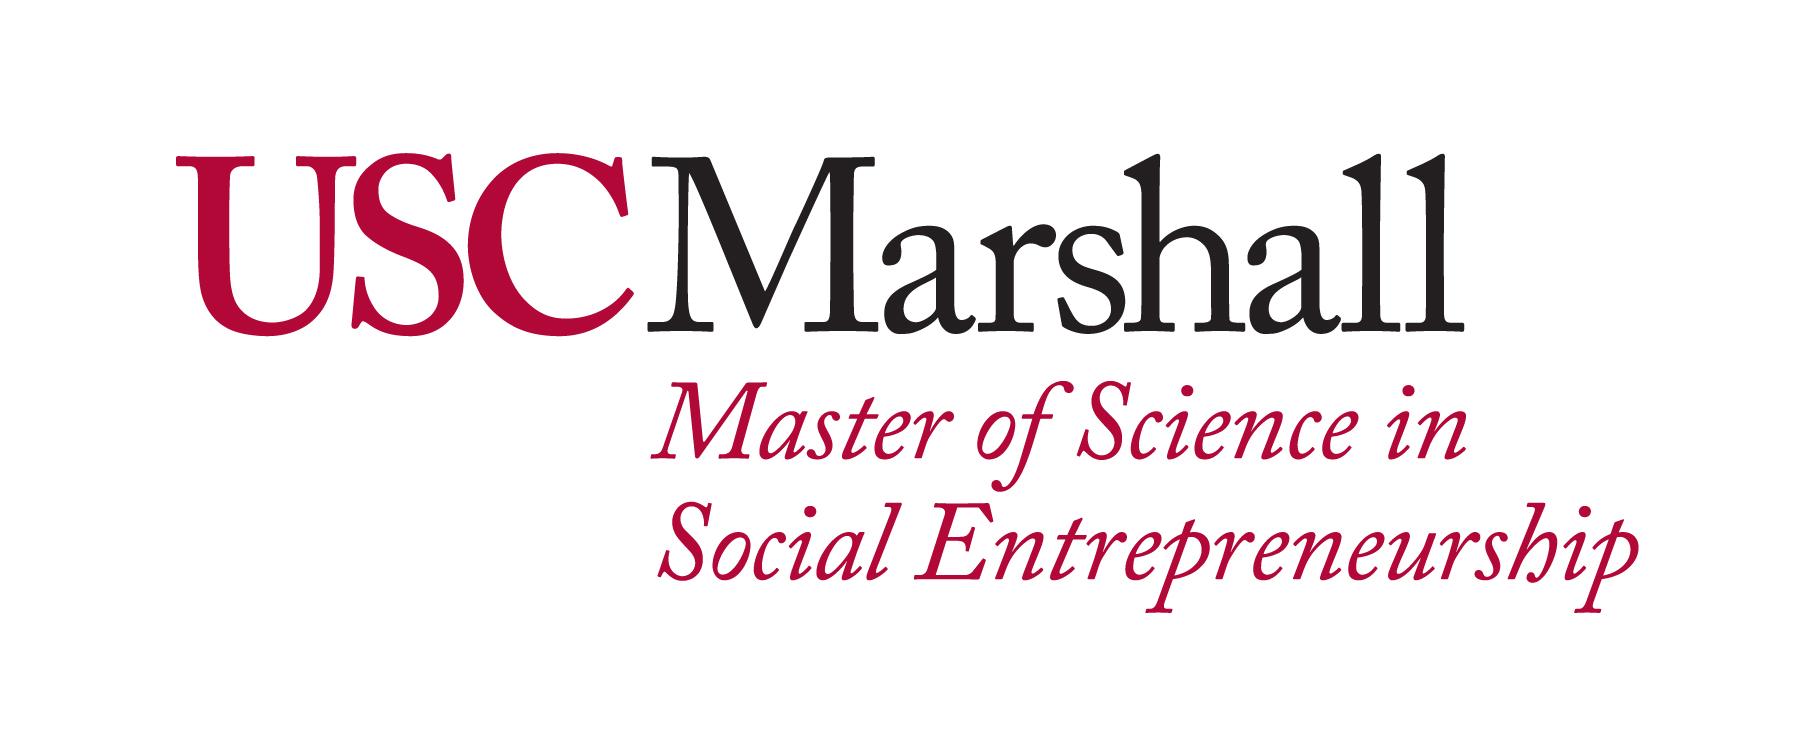 Informal_Marshall_MSSE_CardOnWhite.jpg